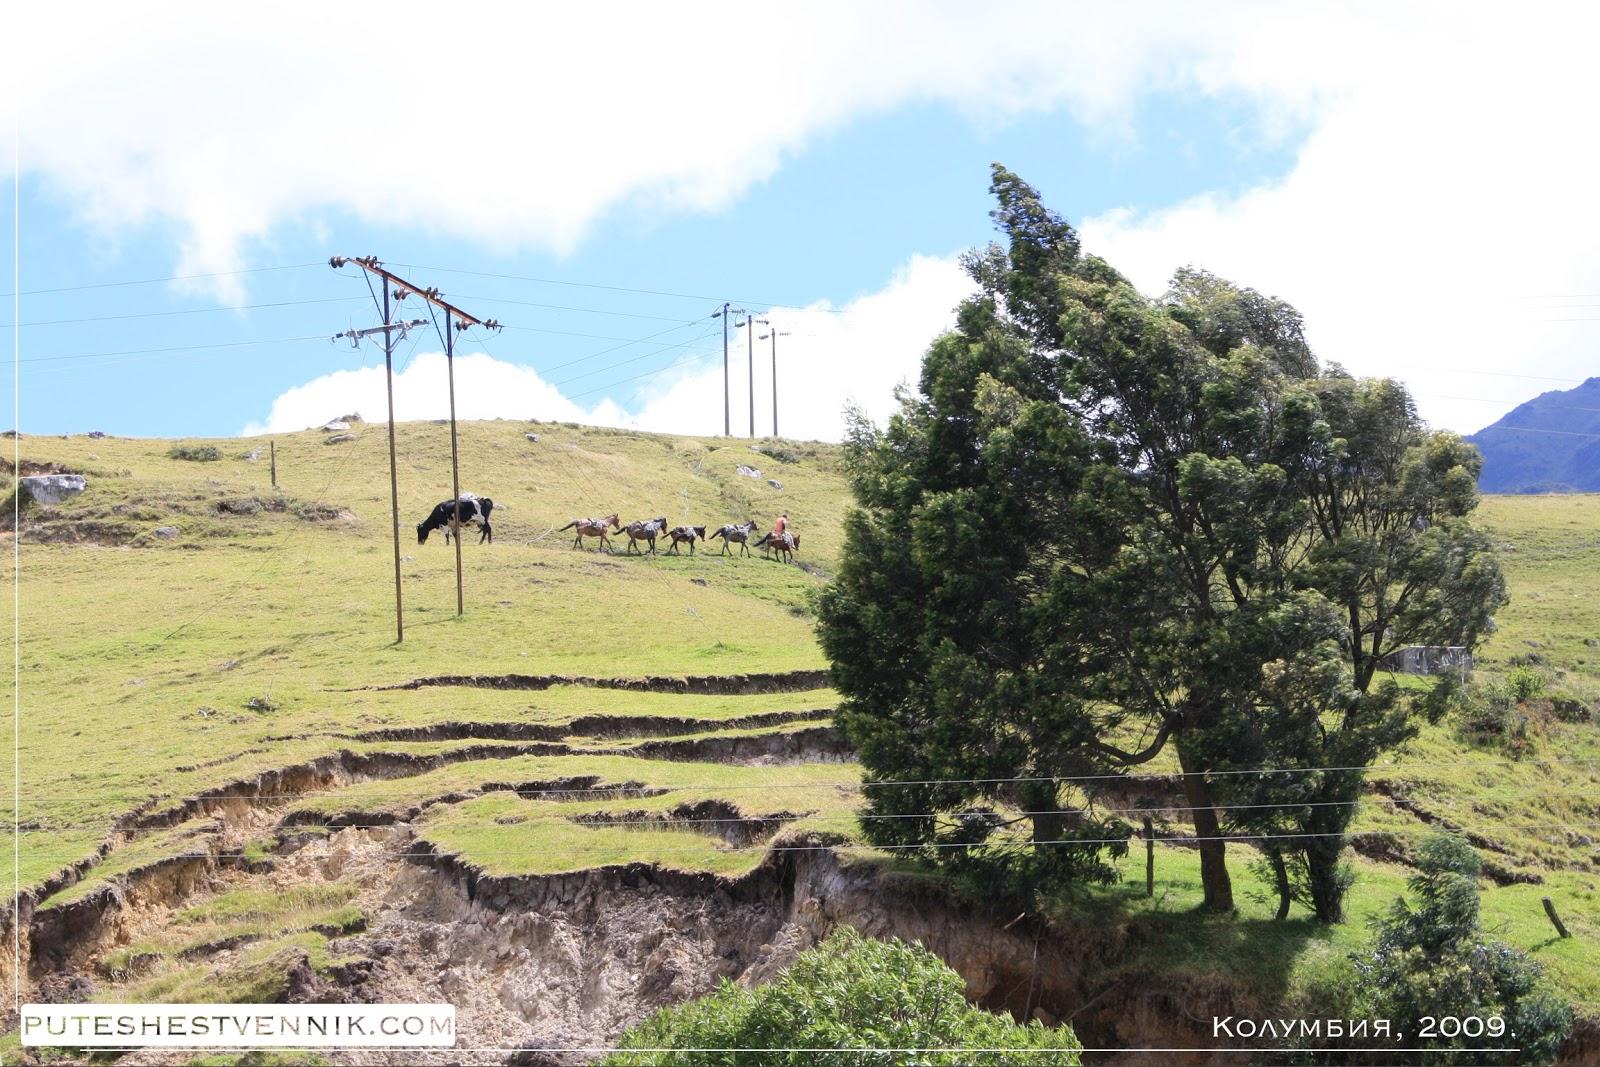 Караван лошадей на склоне горы